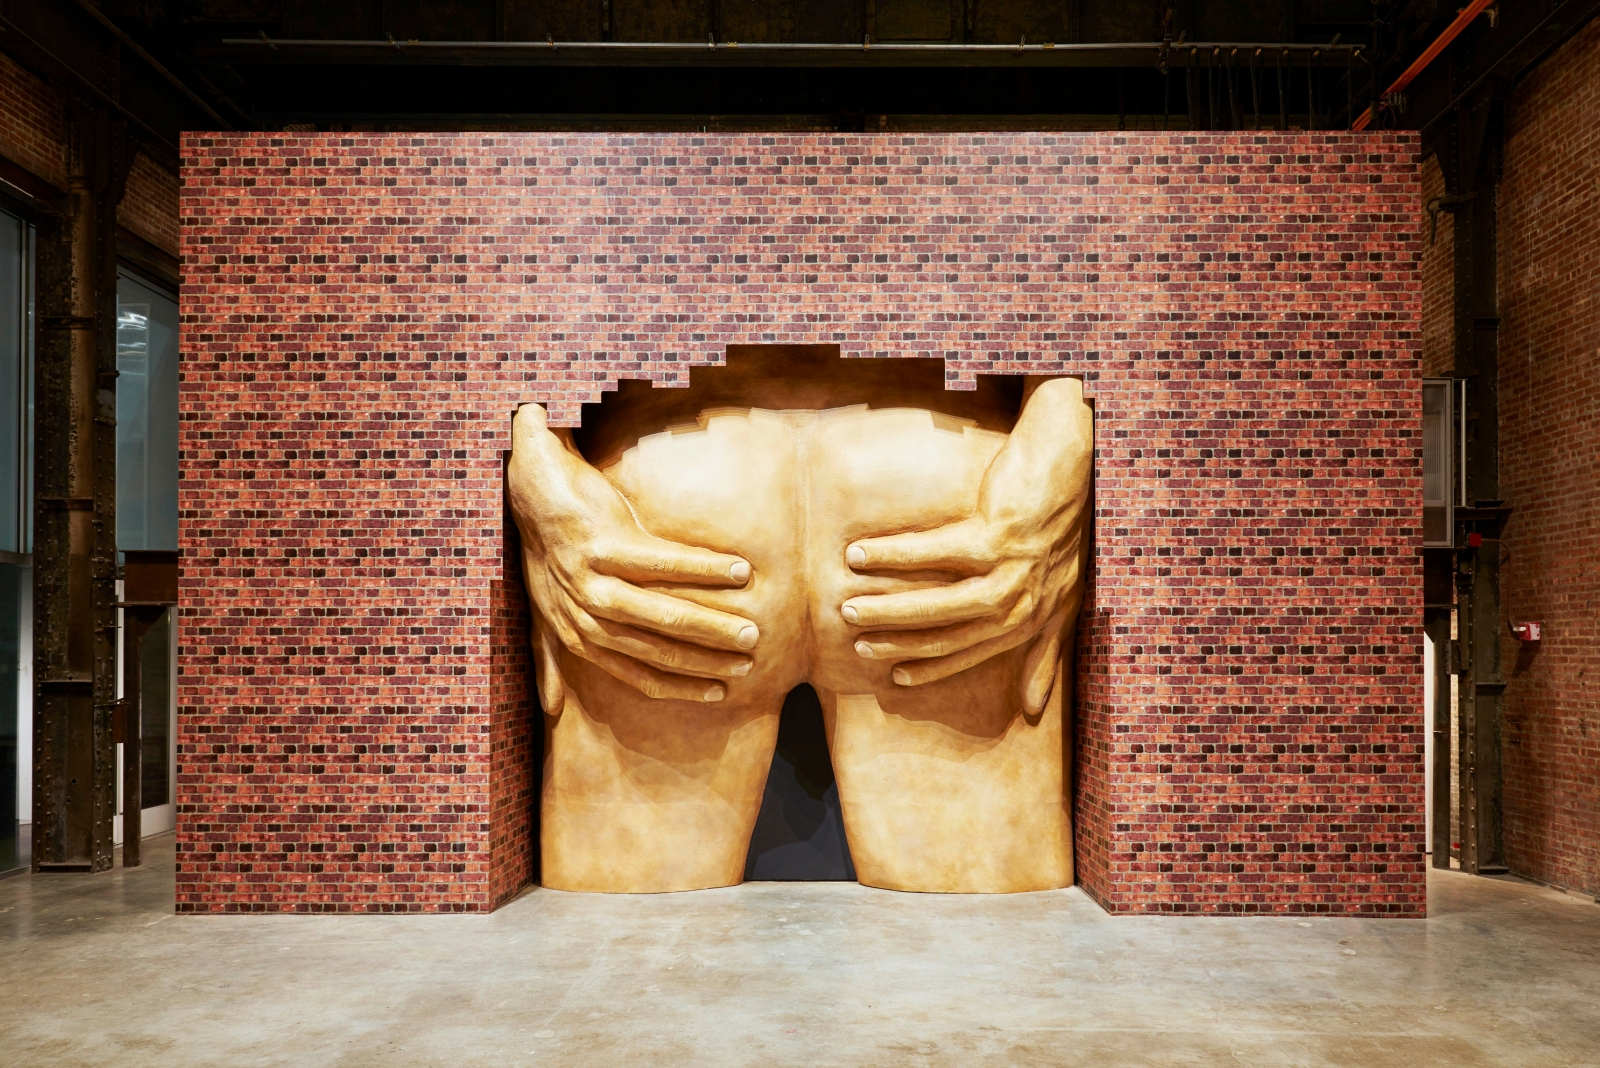 Anthea Hamilton's sculpture of golden buttocks